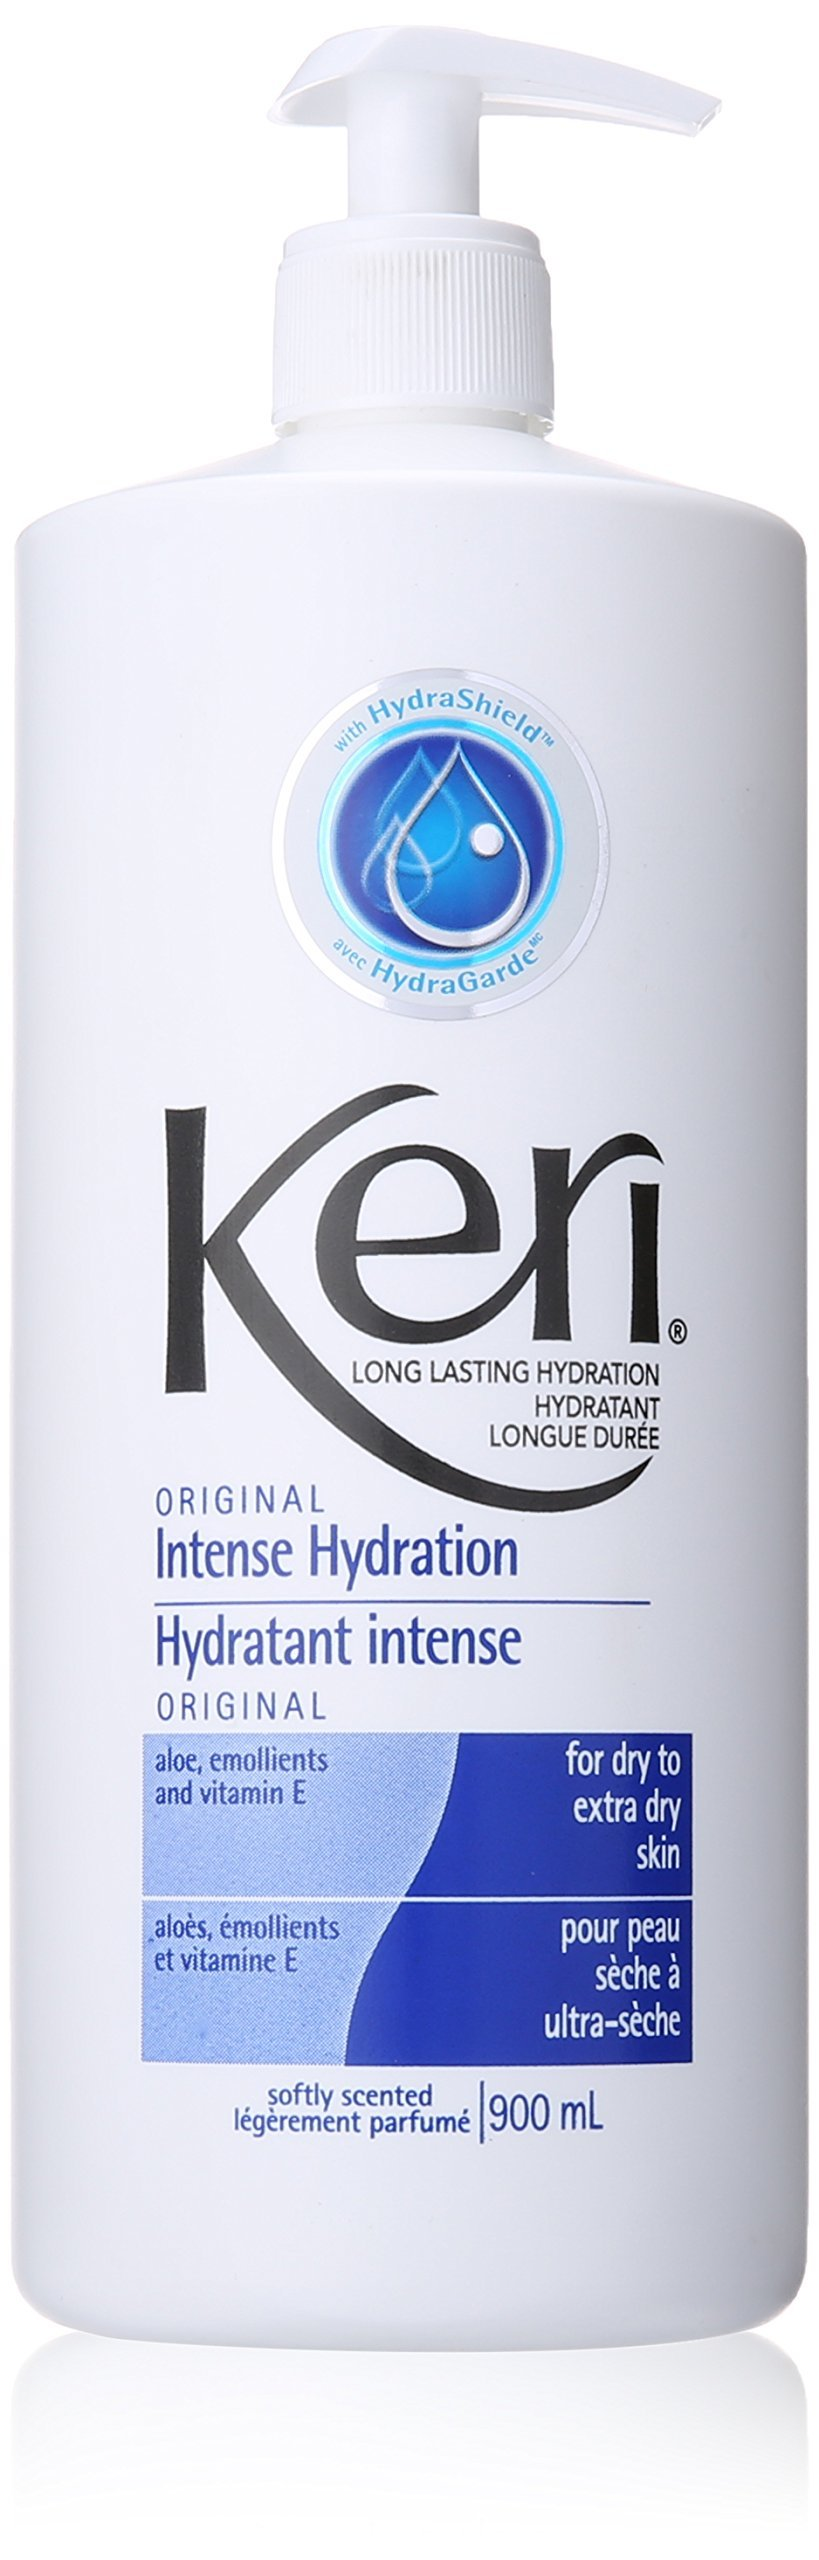 Keri Lotion Original Intense Hydration Softly Scented 900 ML 2 Piece